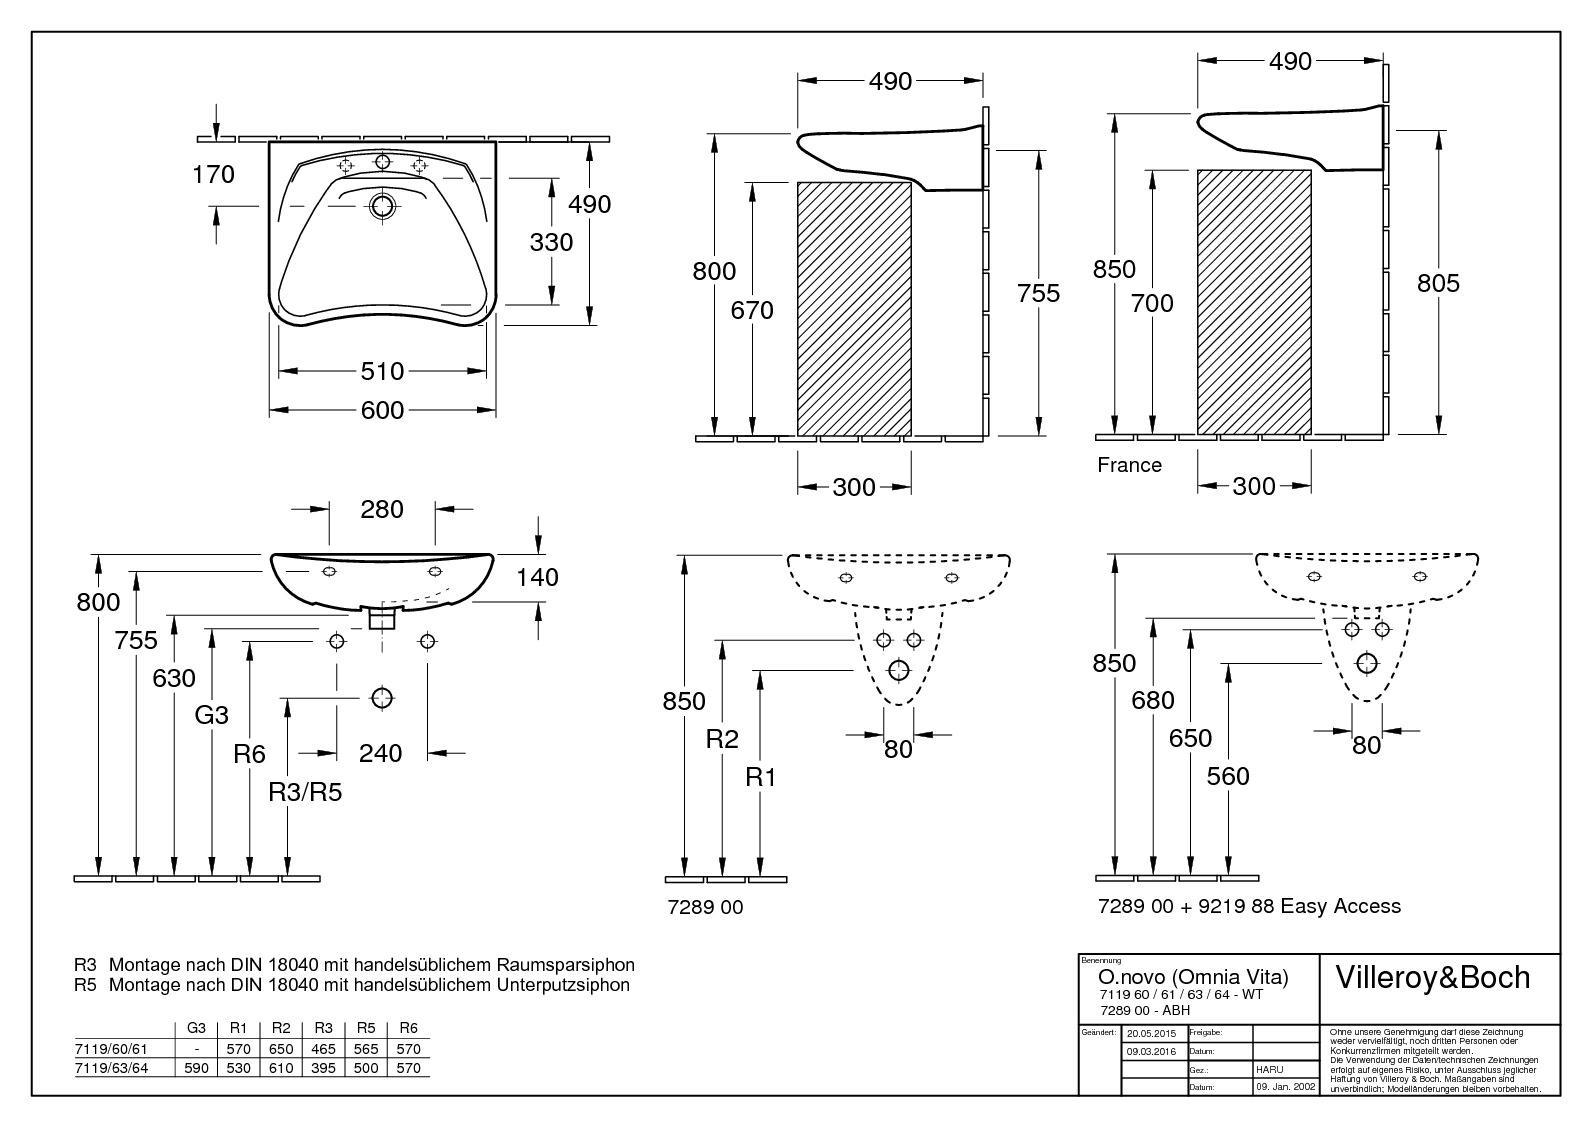 villeroy boch o novo vita waschtisch 600 x 490 mm. Black Bedroom Furniture Sets. Home Design Ideas